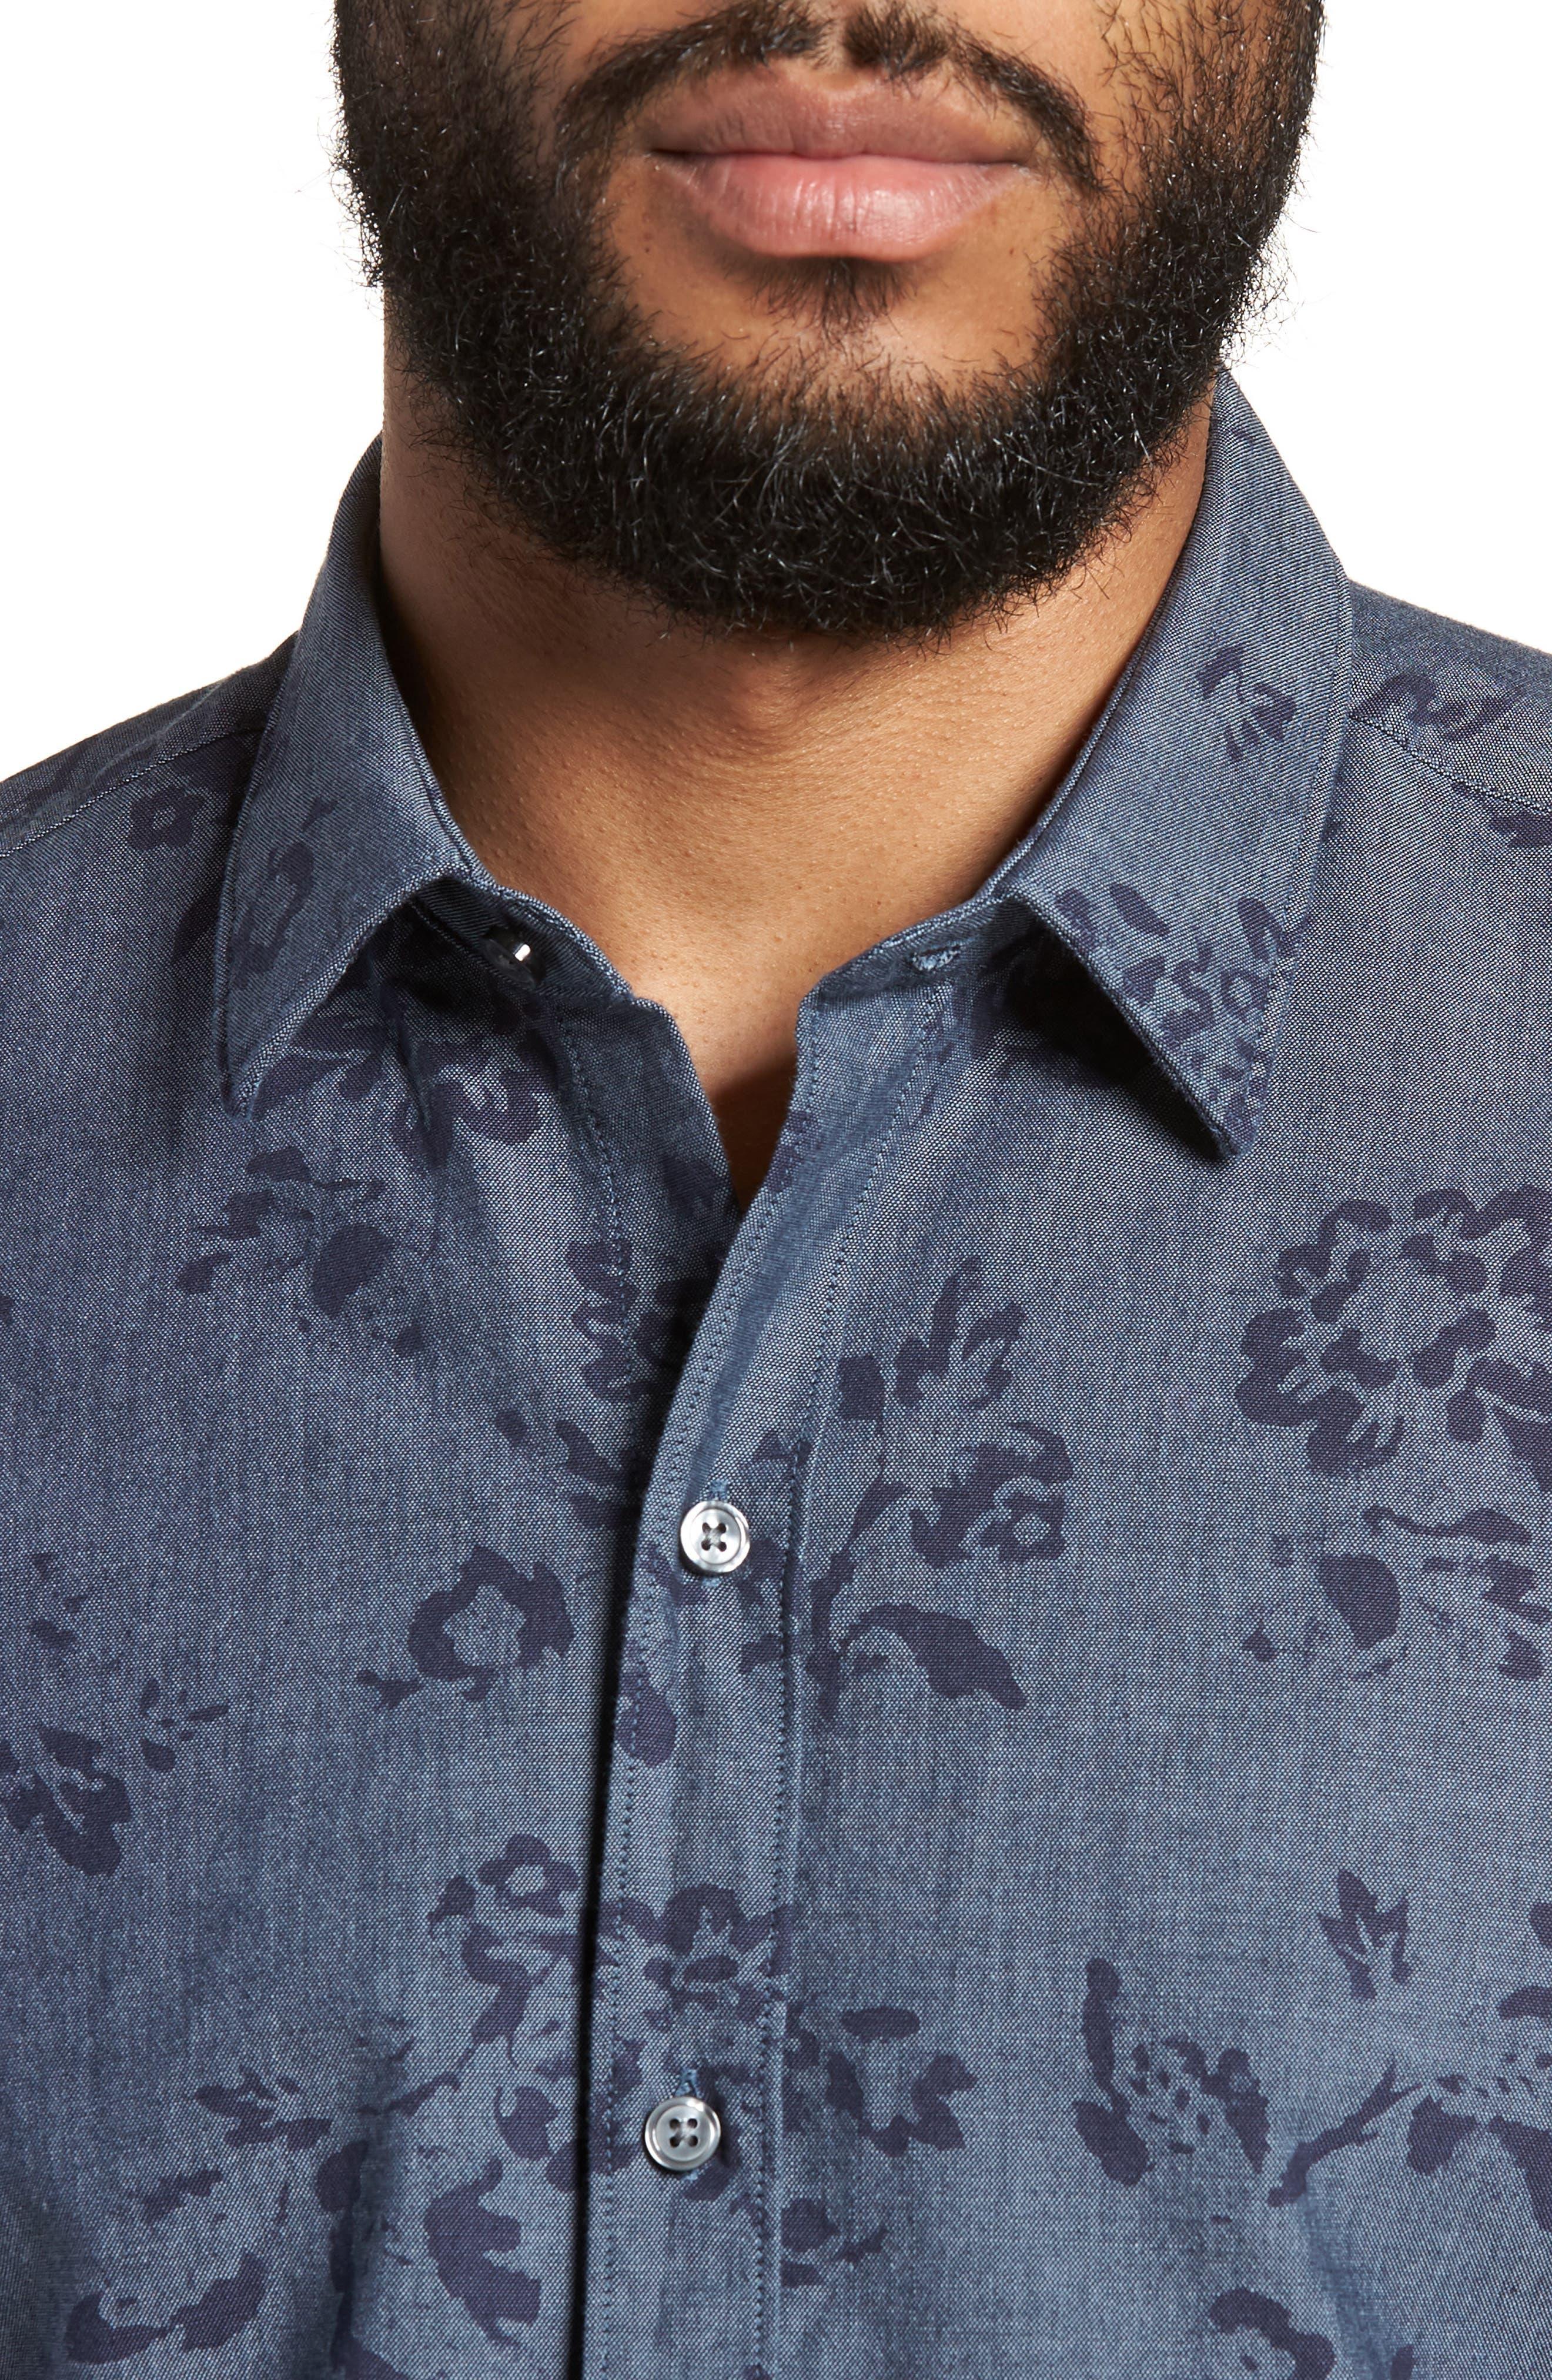 Robb Trim Fit Floral Short Sleeve Sport Shirt,                             Alternate thumbnail 4, color,                             410